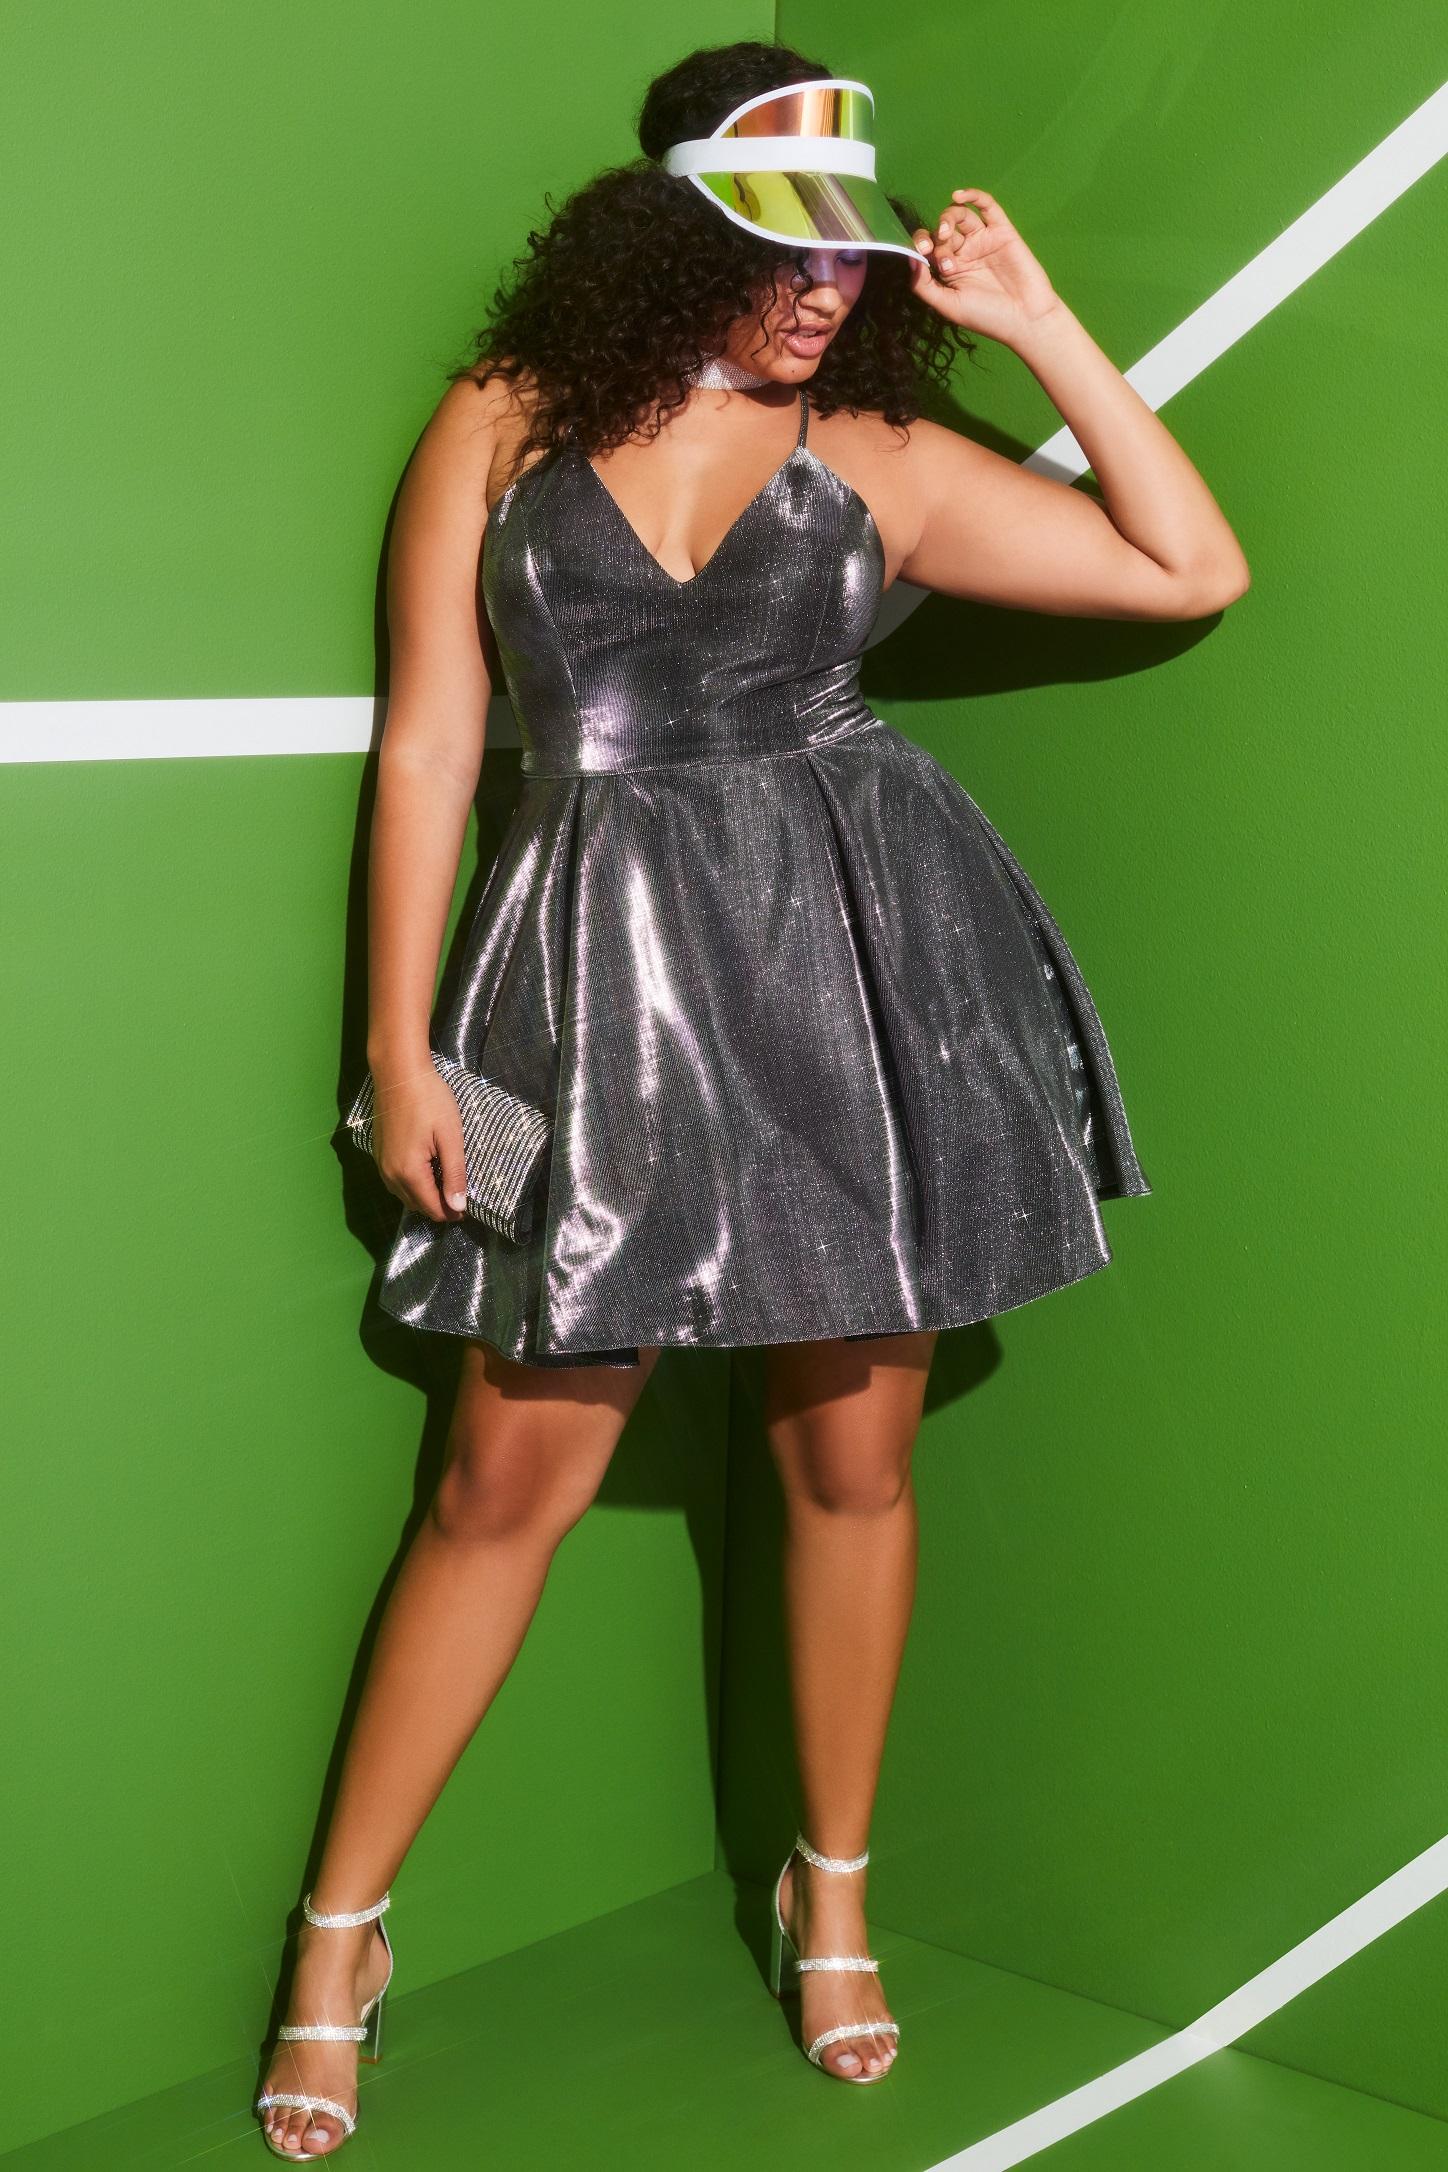 Girl in silver metallic short homecoming dress